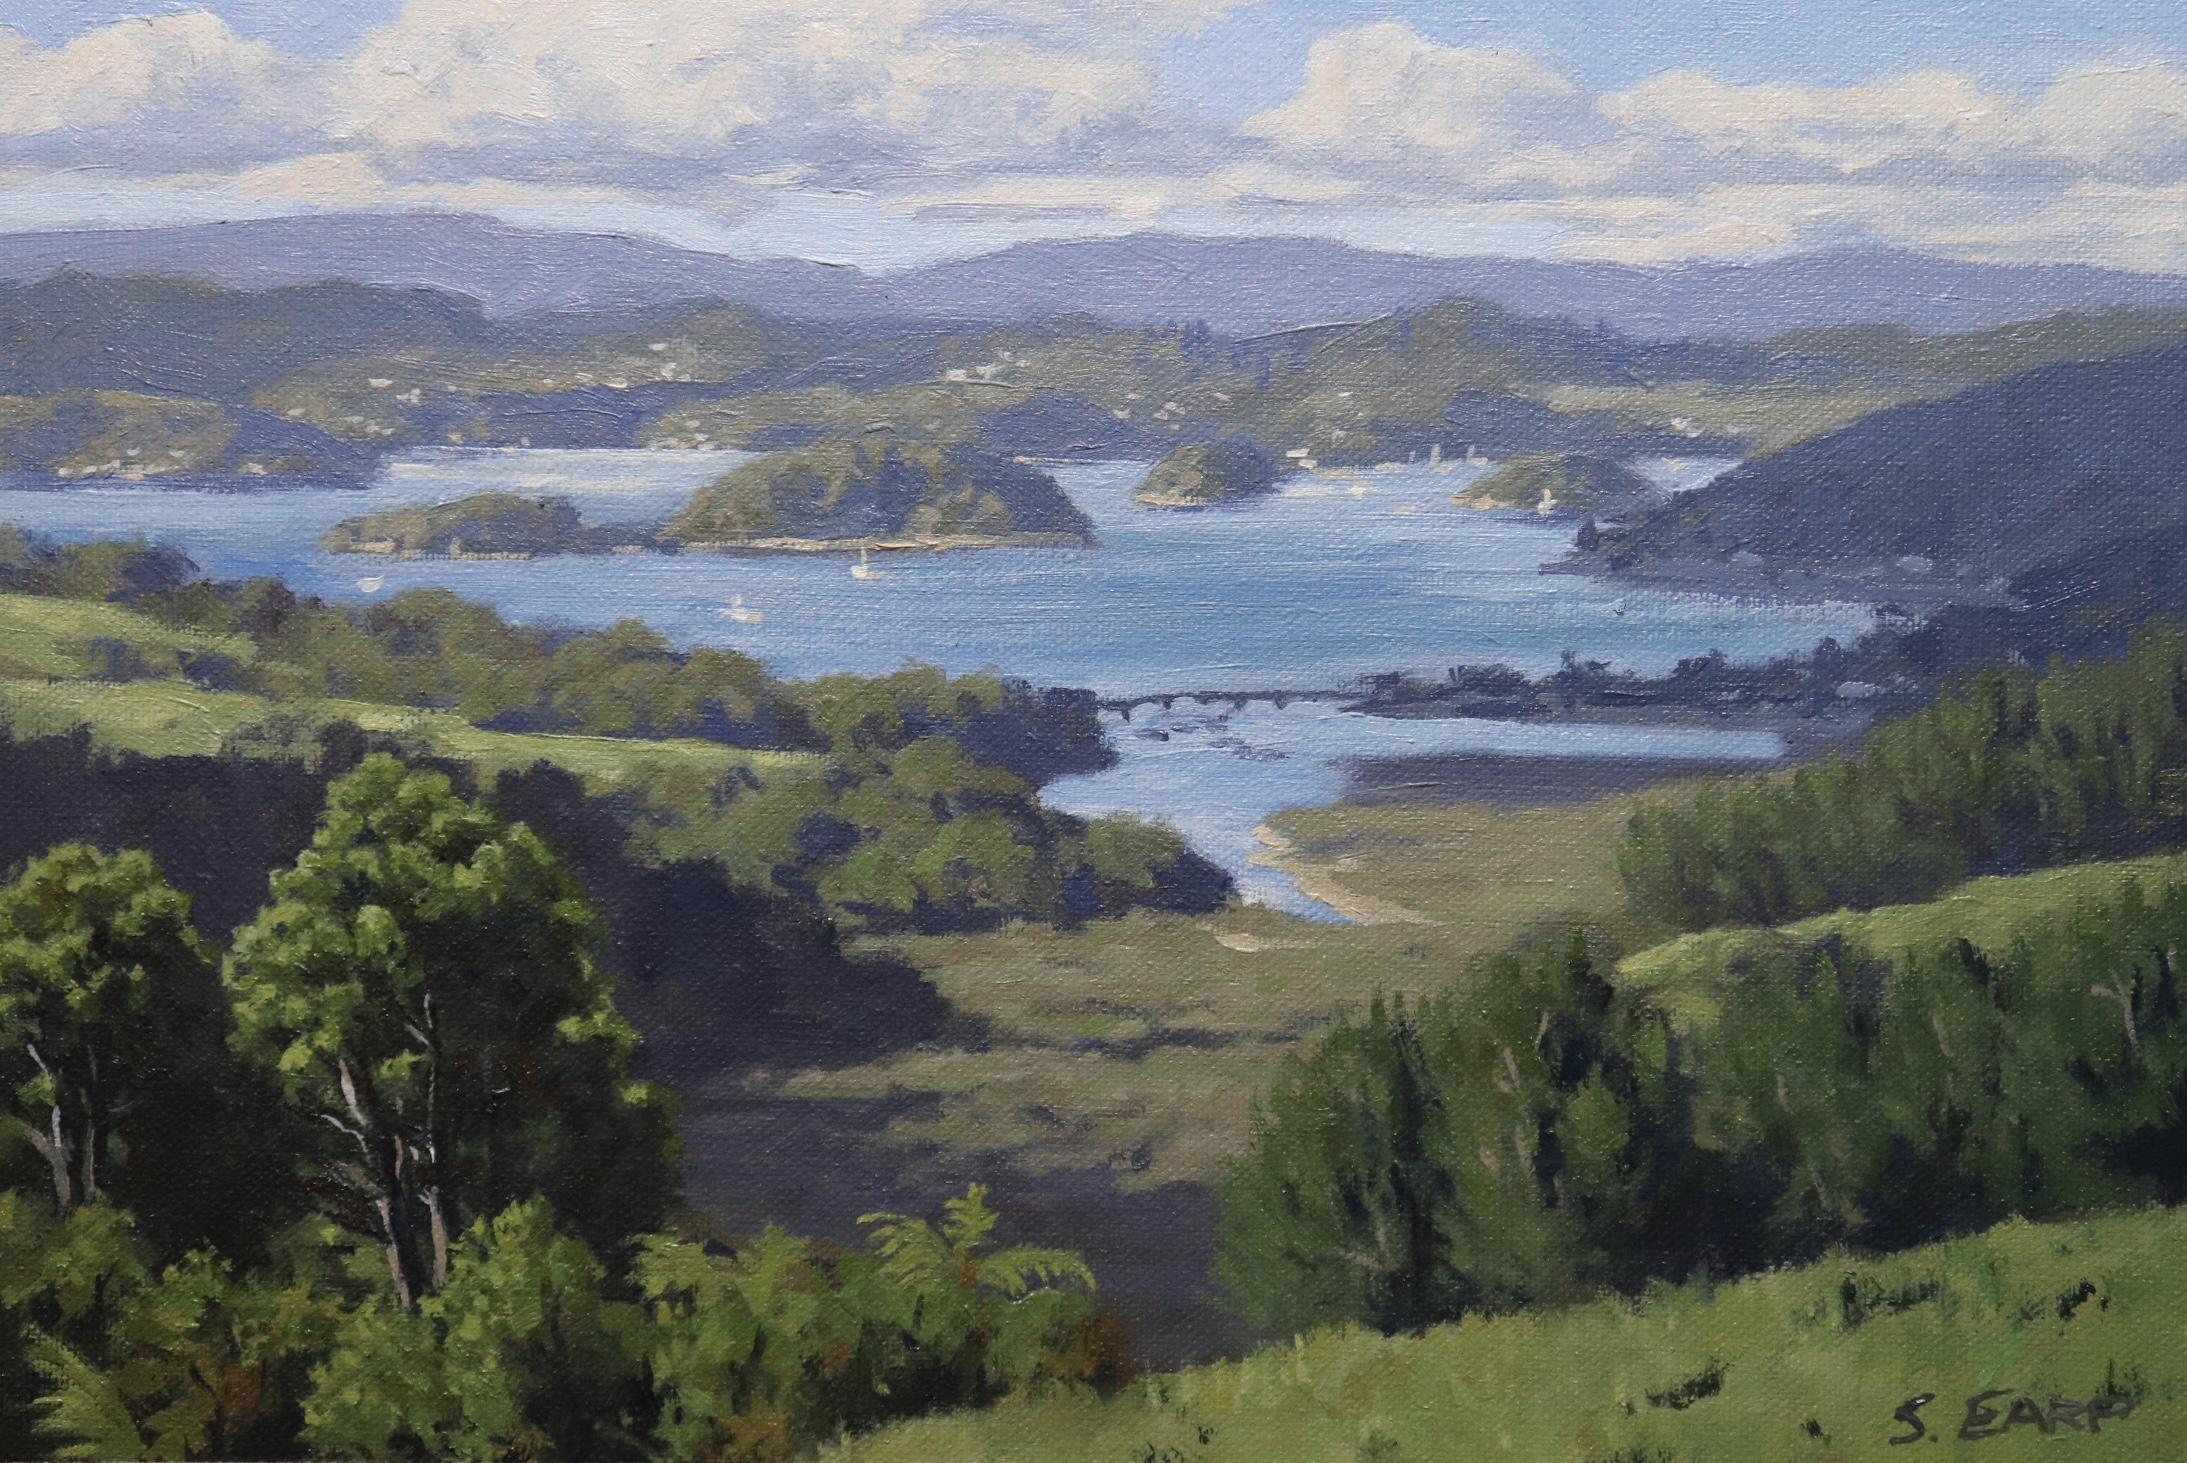 Bay of Islands - New Zealand - Samuel Earp - Oil Painting.jpg